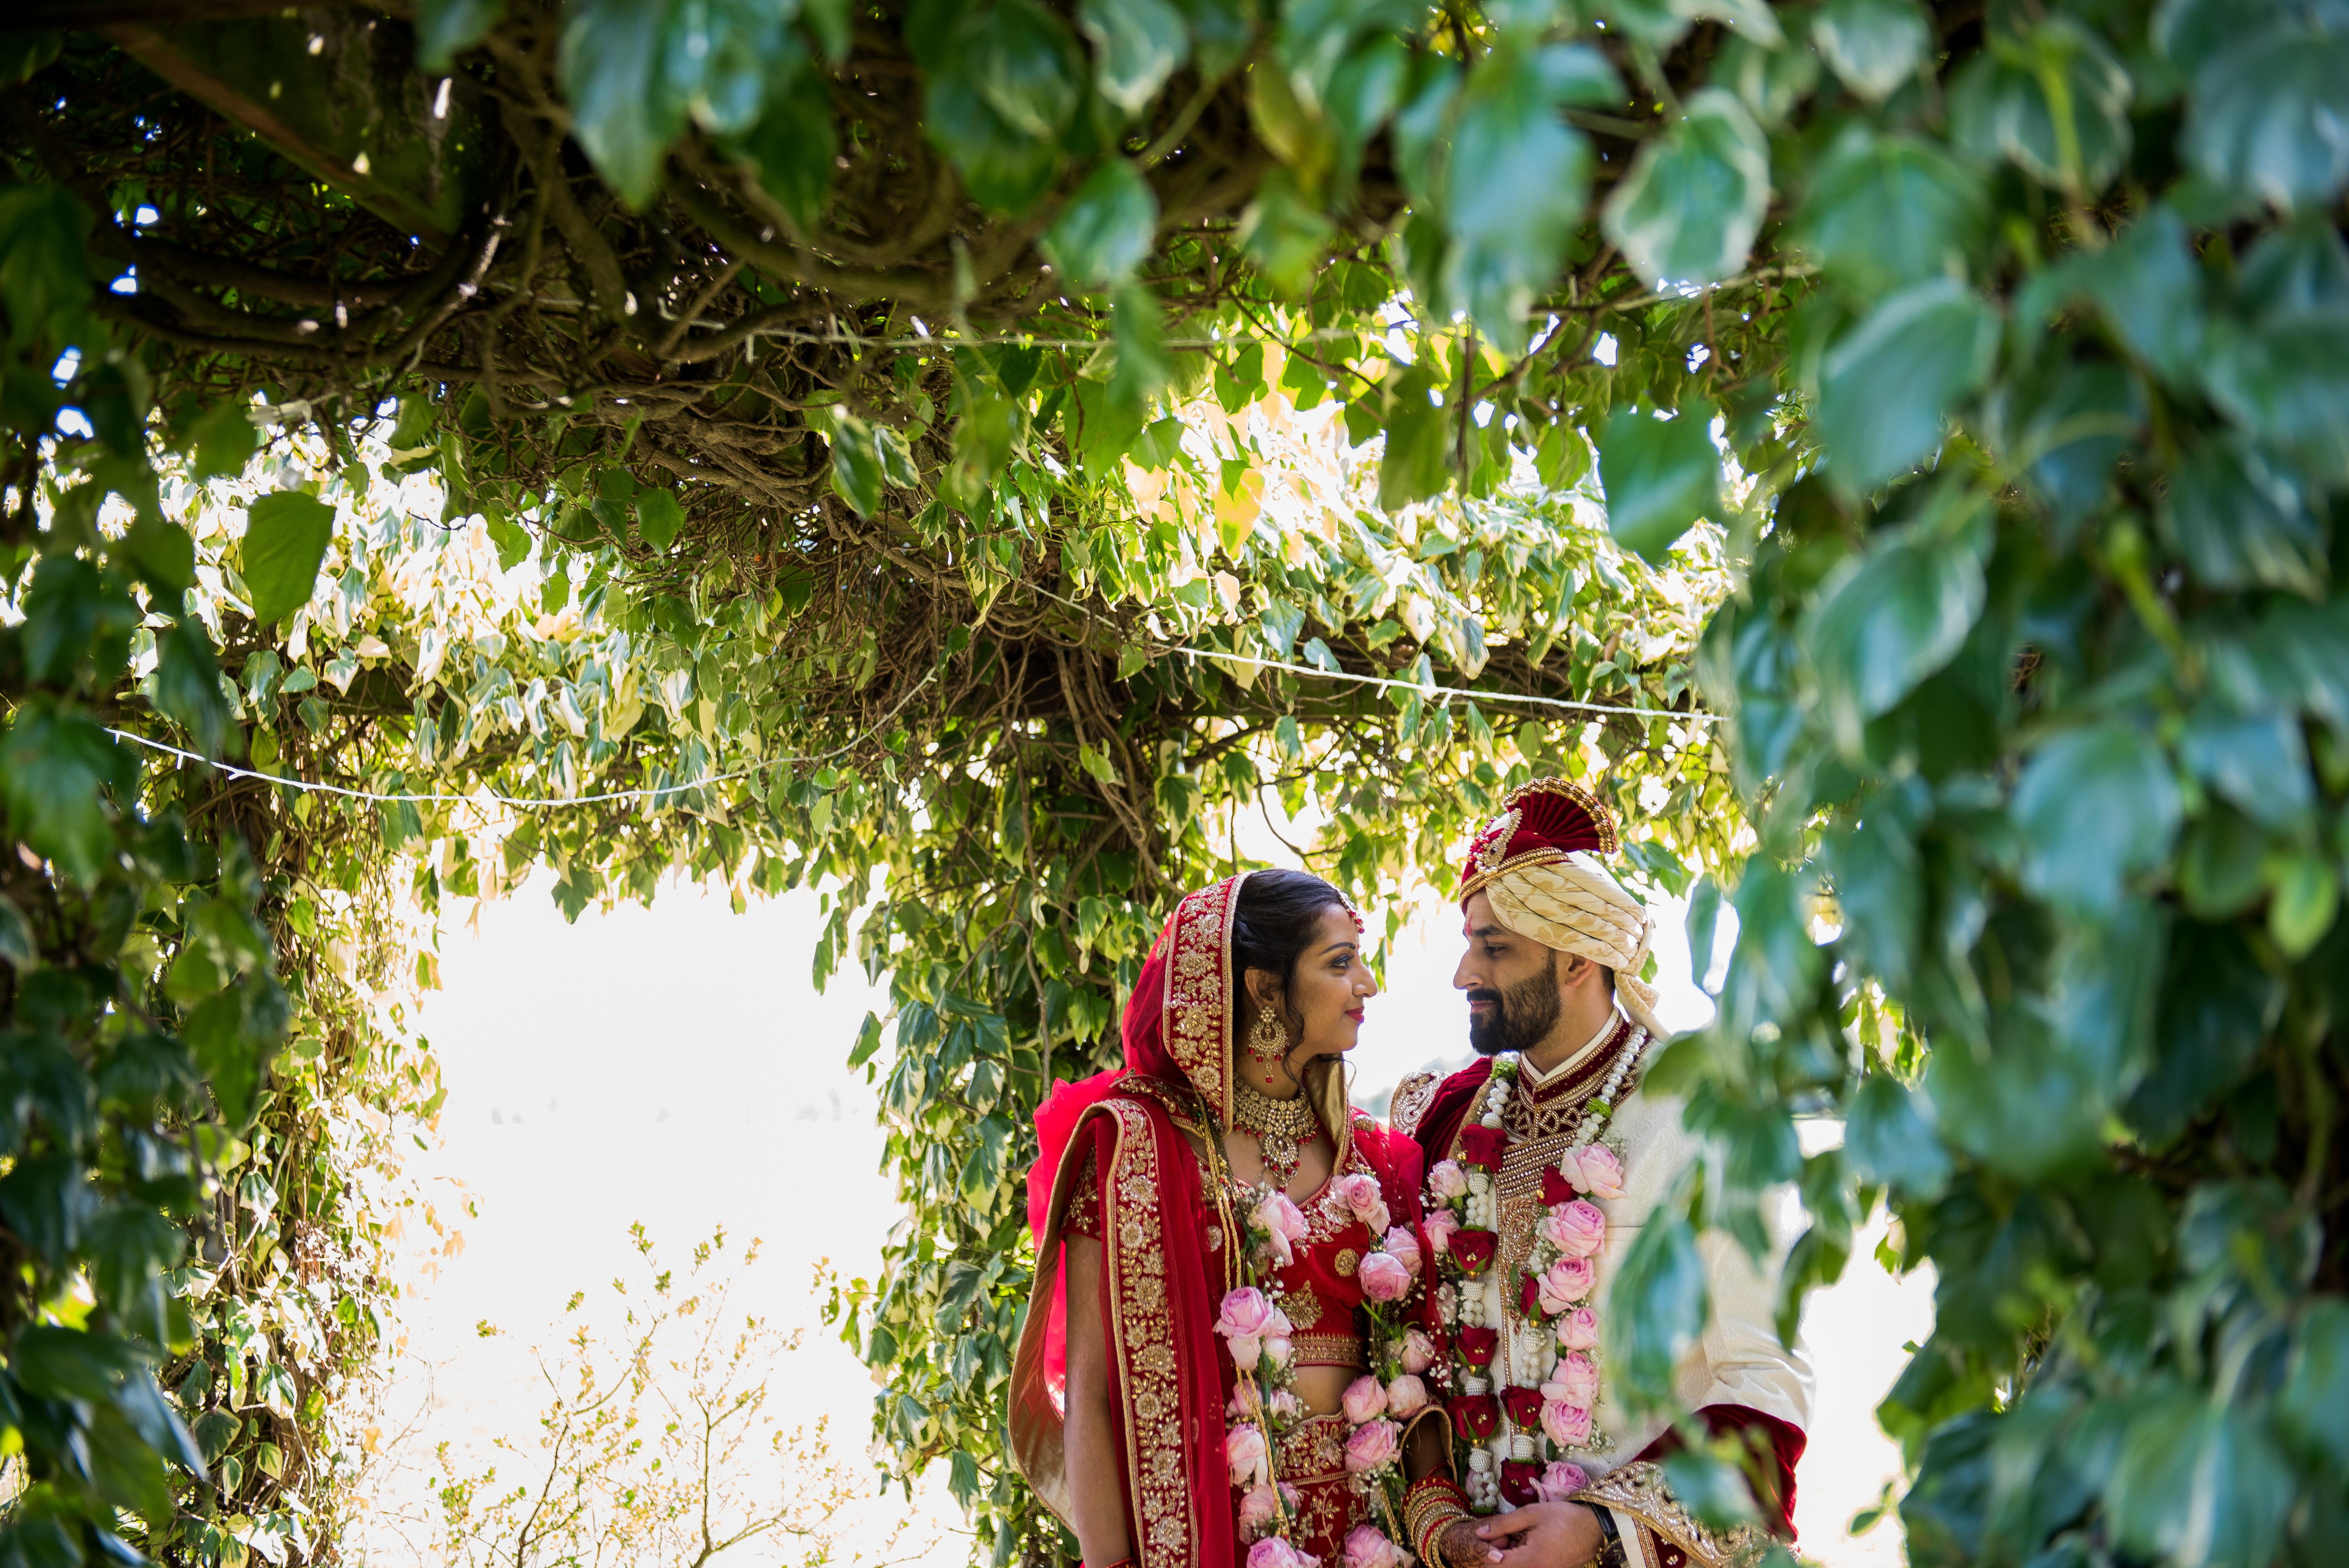 Asian wedding at Whittlebury Park